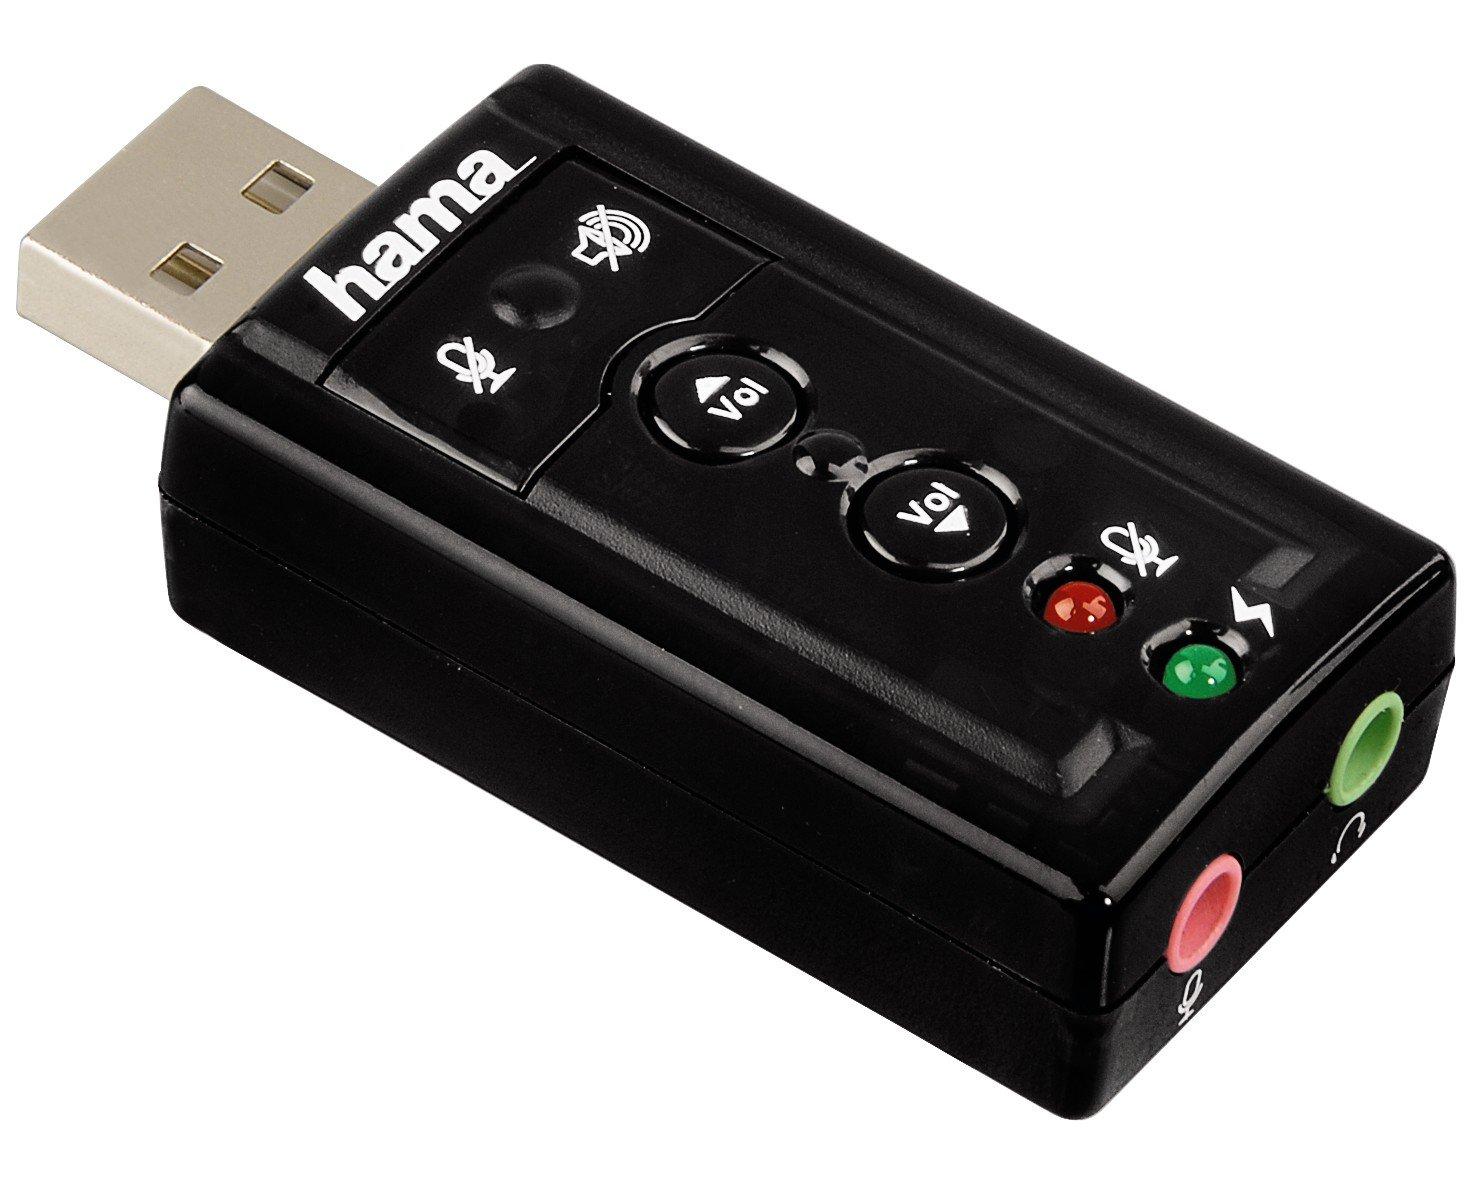 Hama - USB Sound Card 7.1 Surround, 0 bit, 7.1, 0 Db, USB: Amazon ...